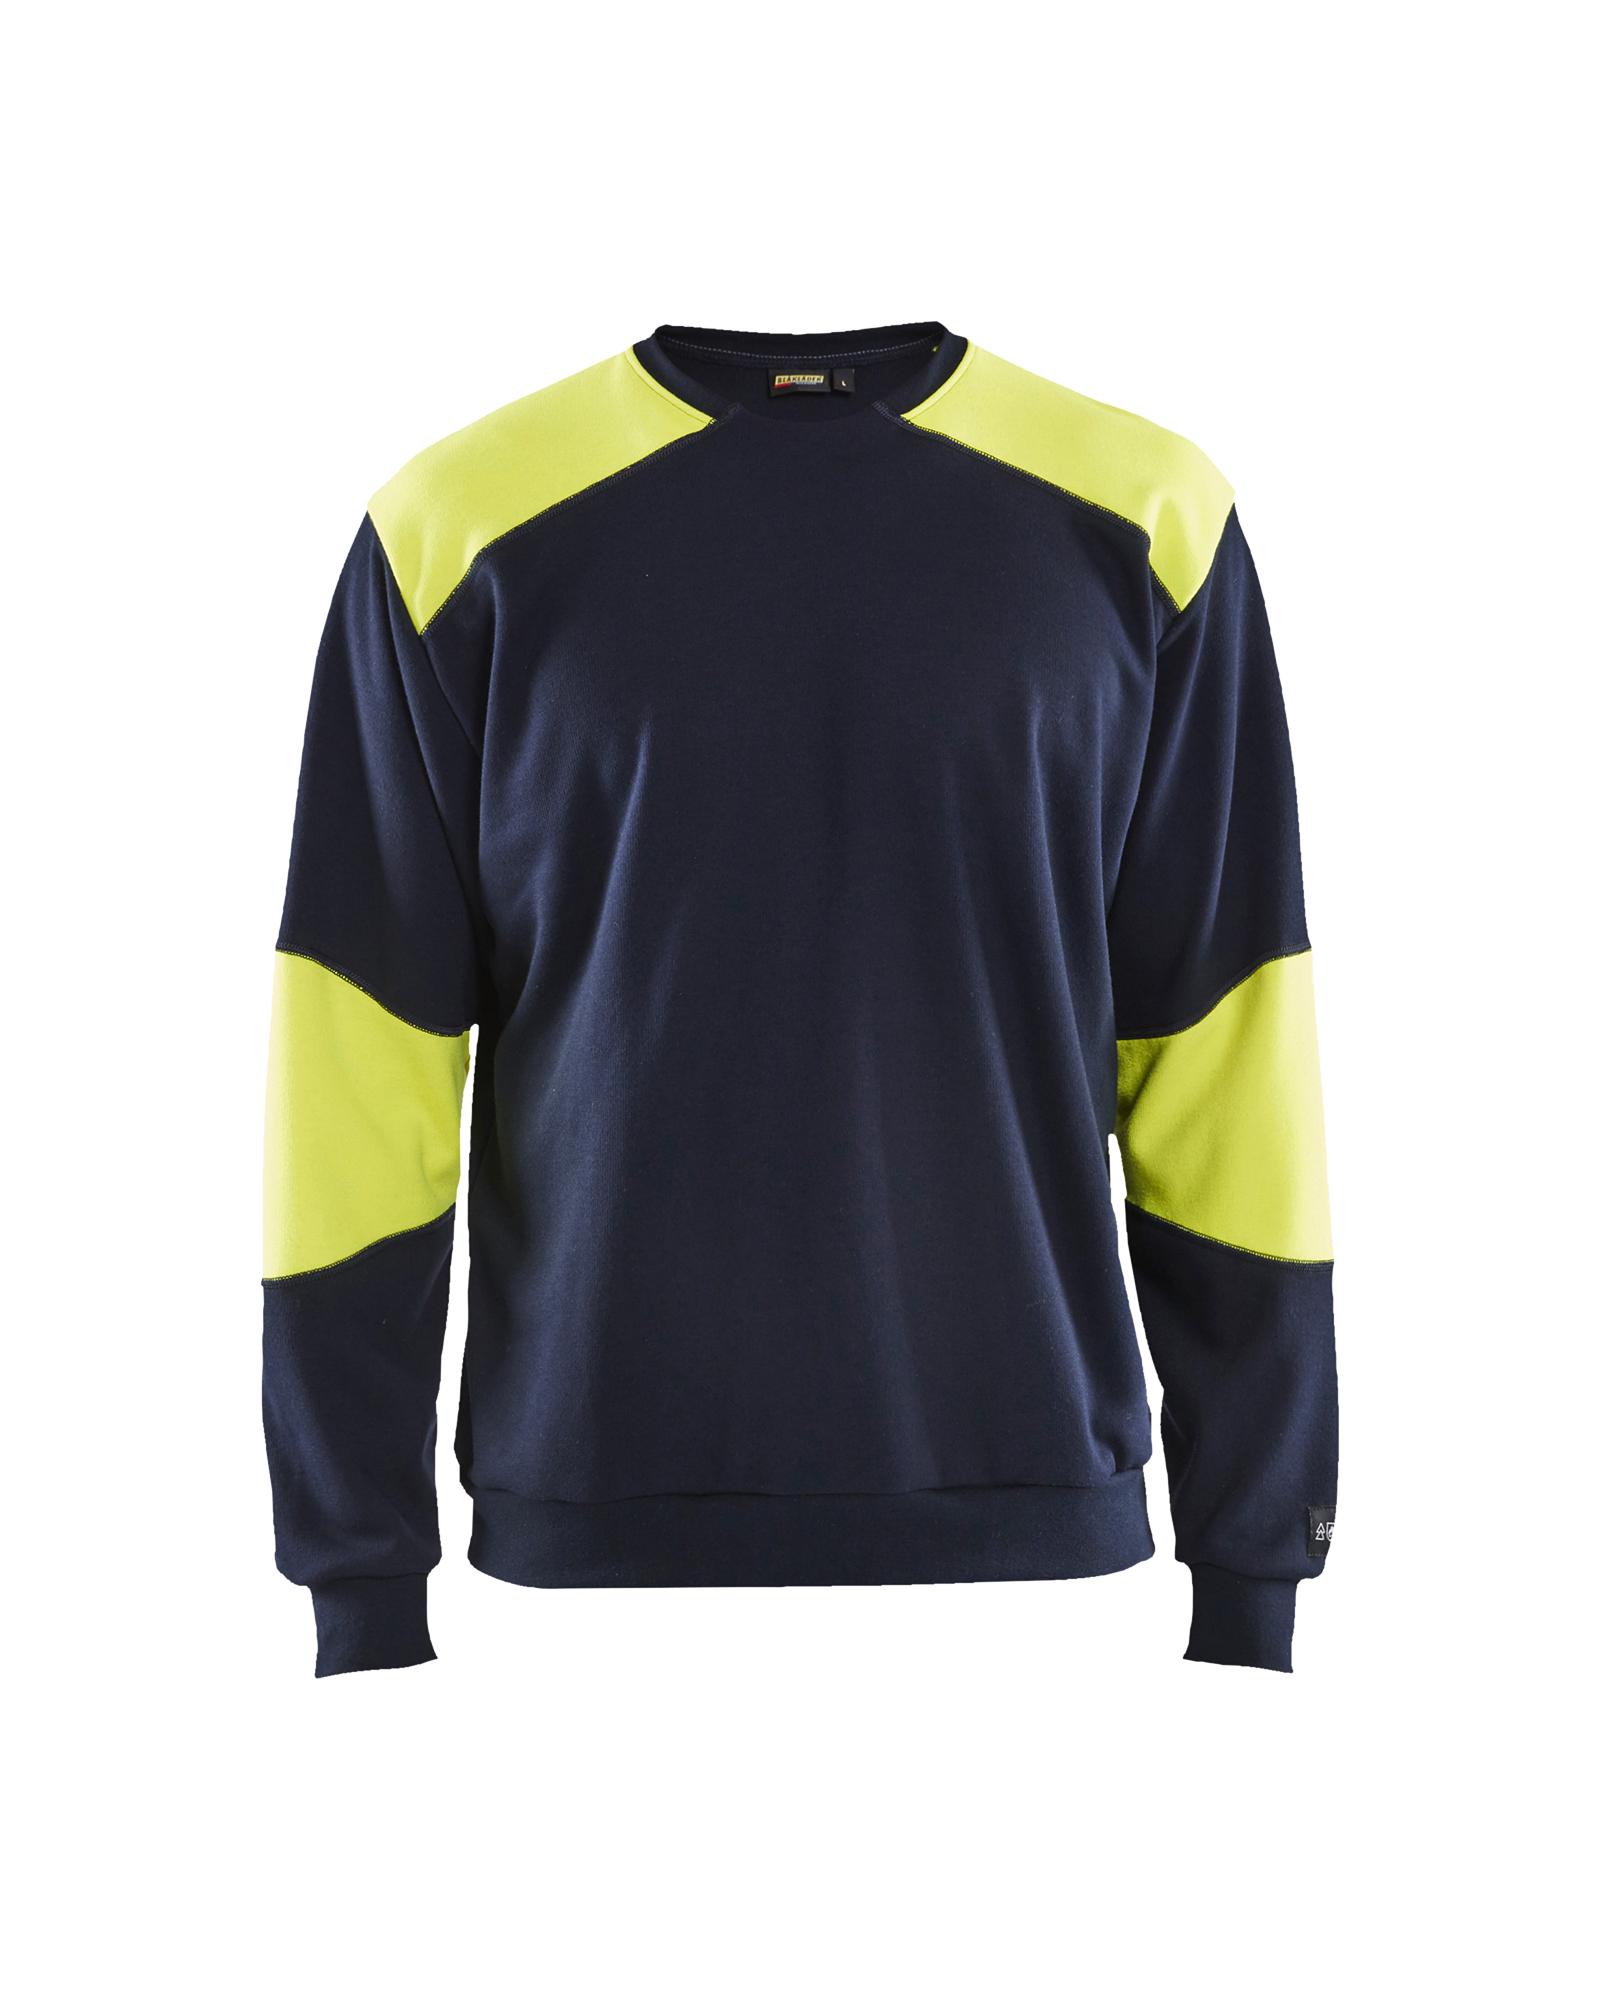 FR sweatshirt